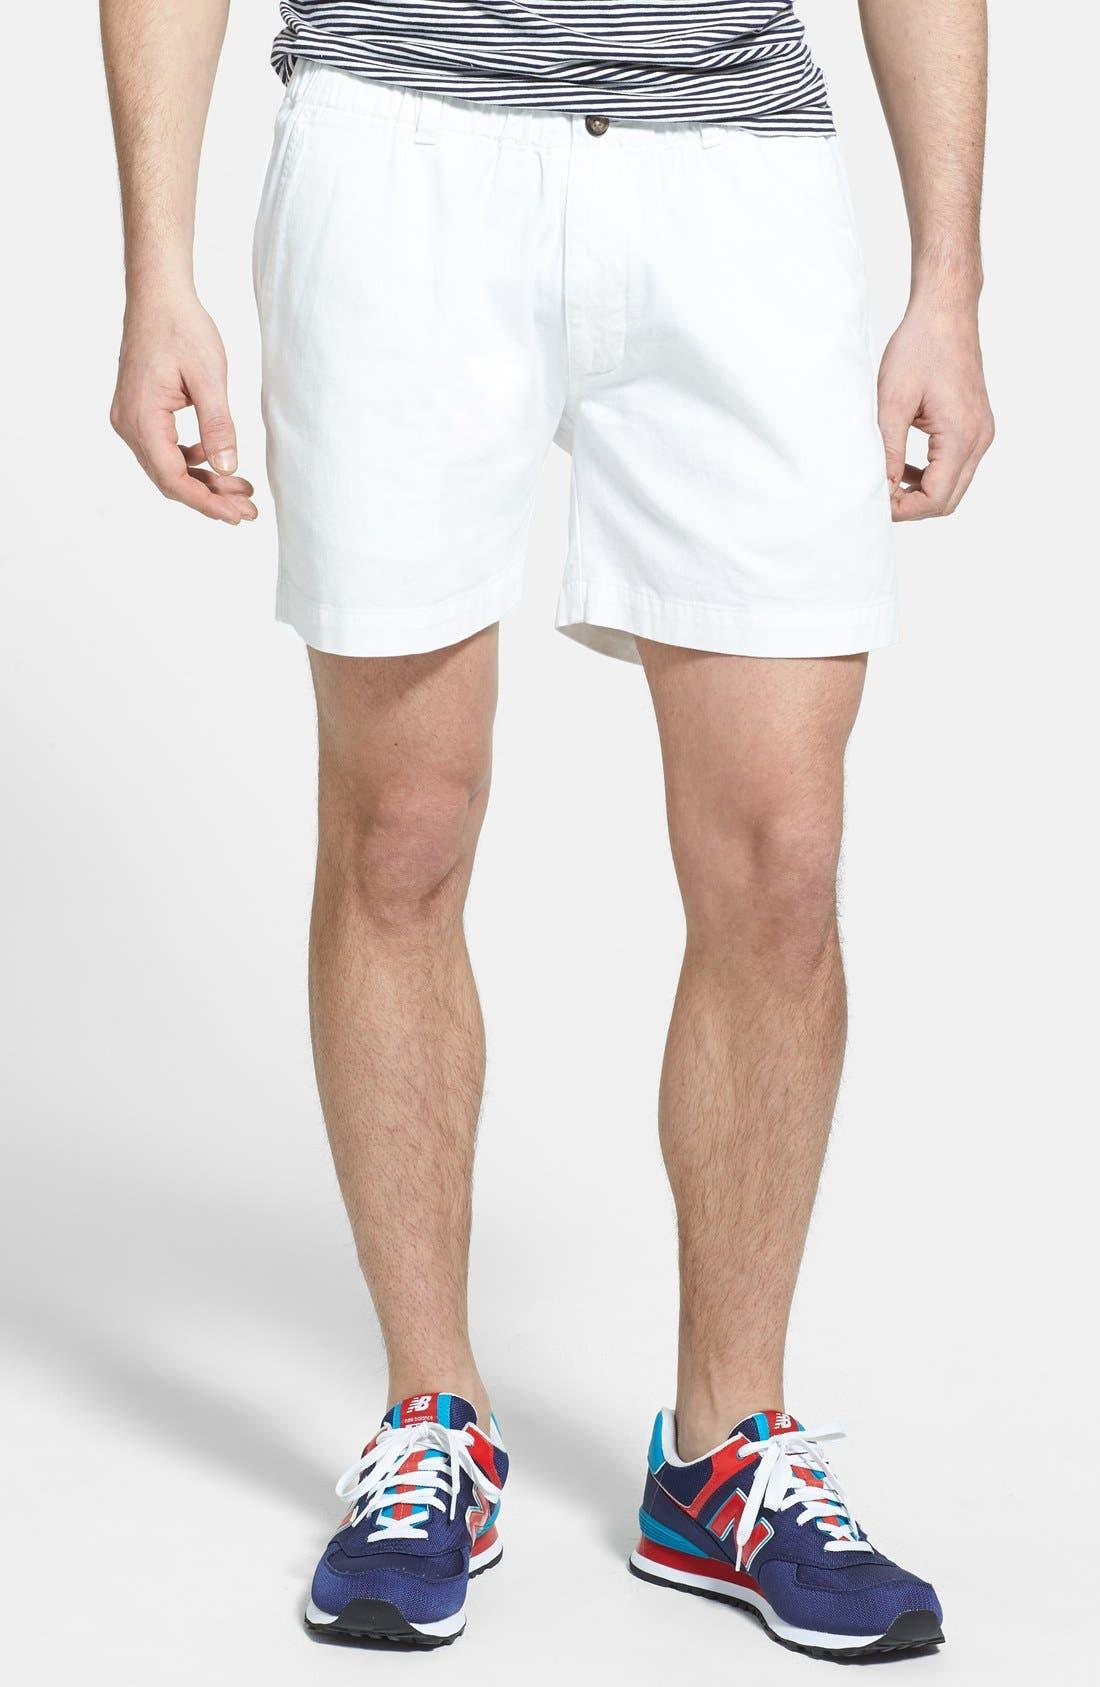 Vintage 1946 'Snappers' Vintage Washed Elastic Waistband Shorts